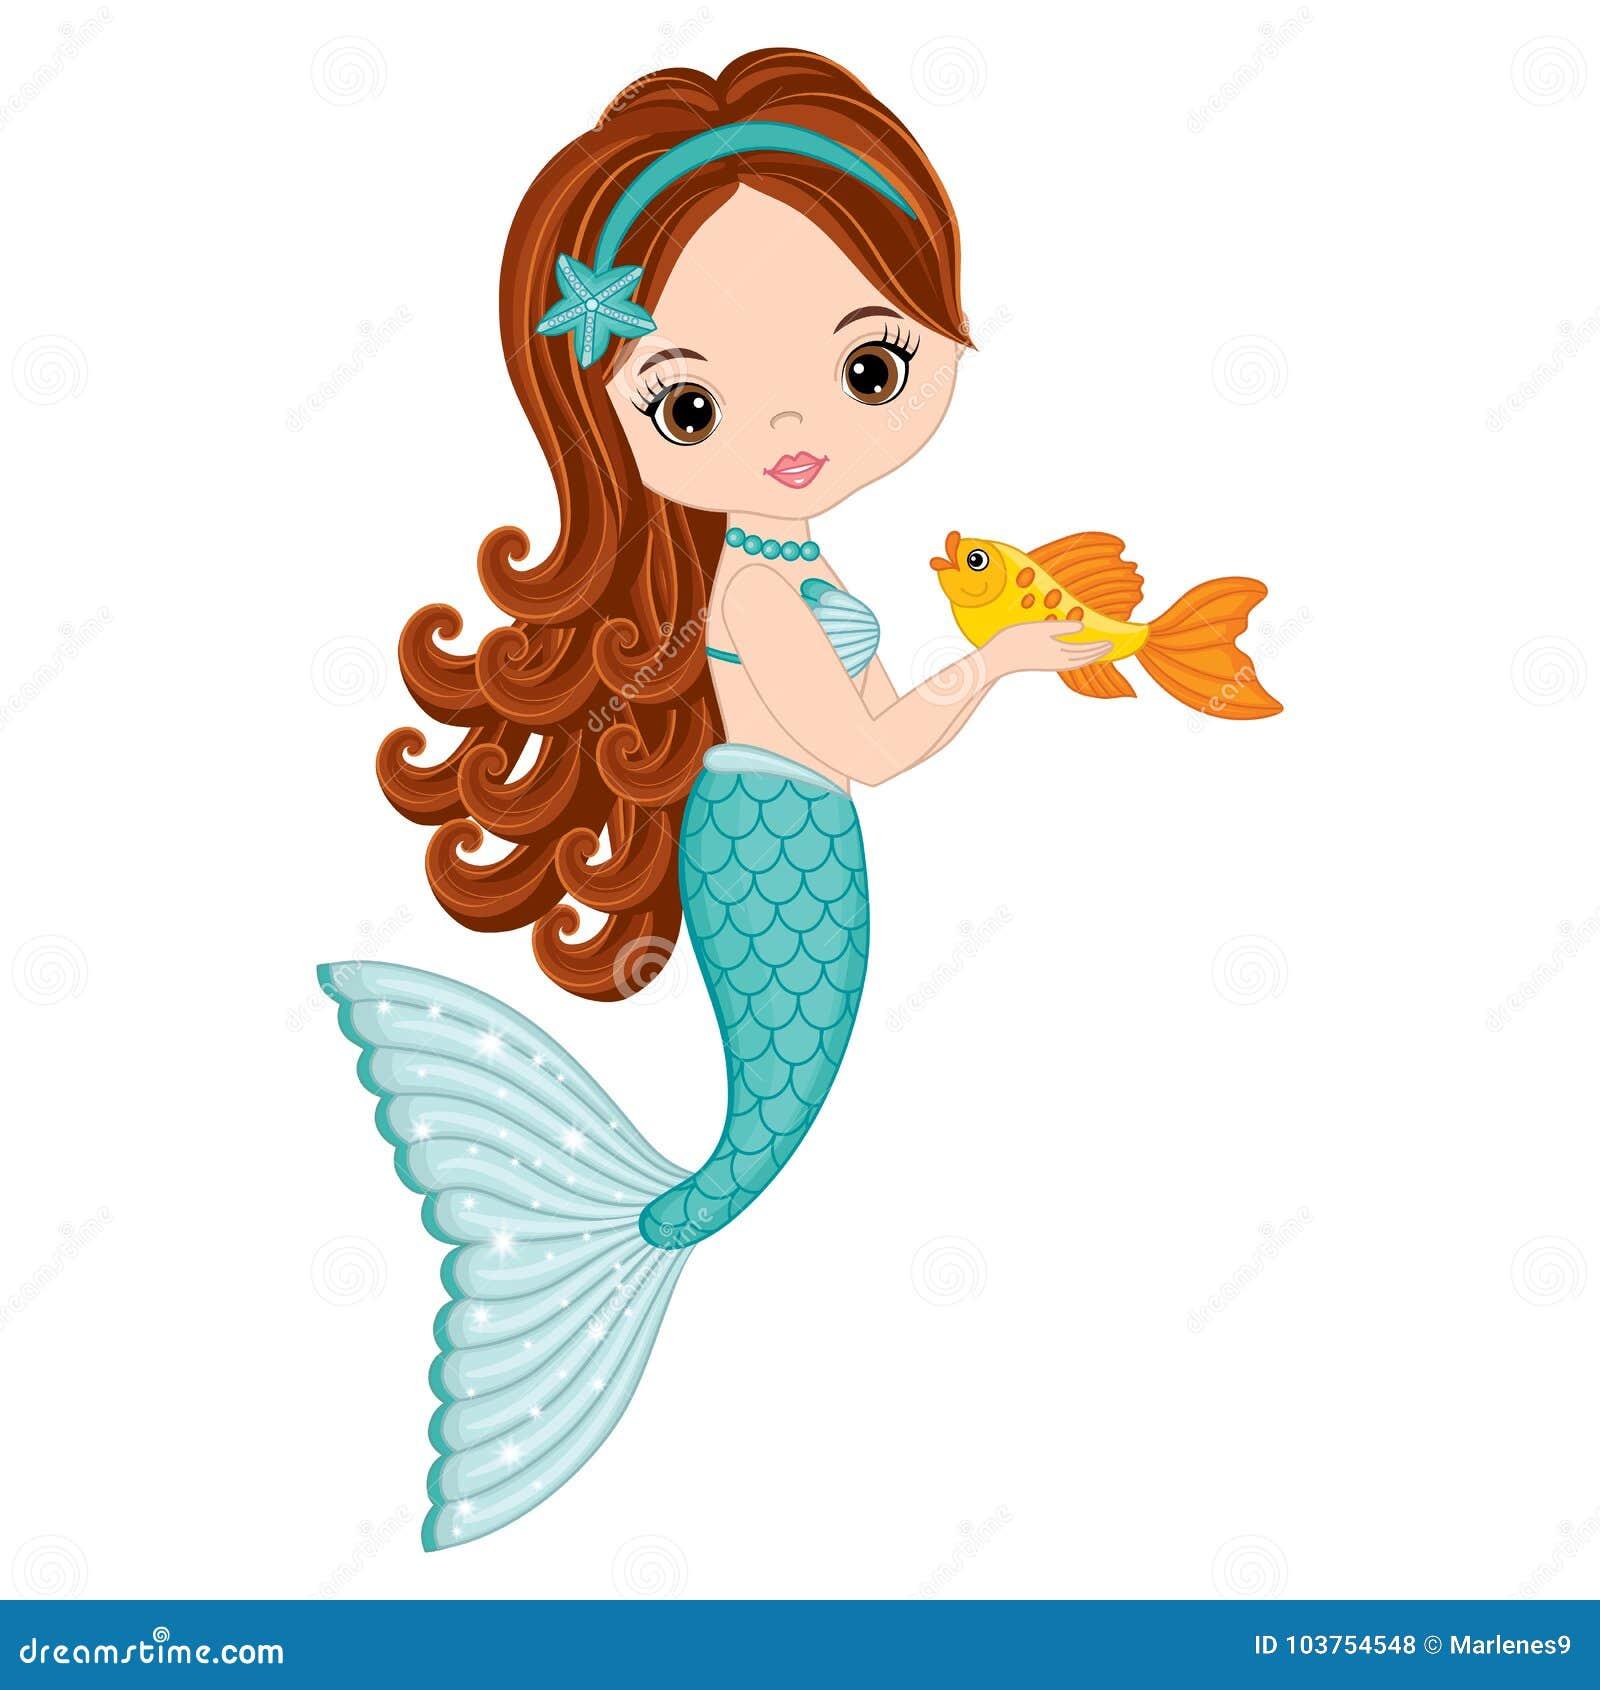 Meerjungfrau Bilder Kostenlos